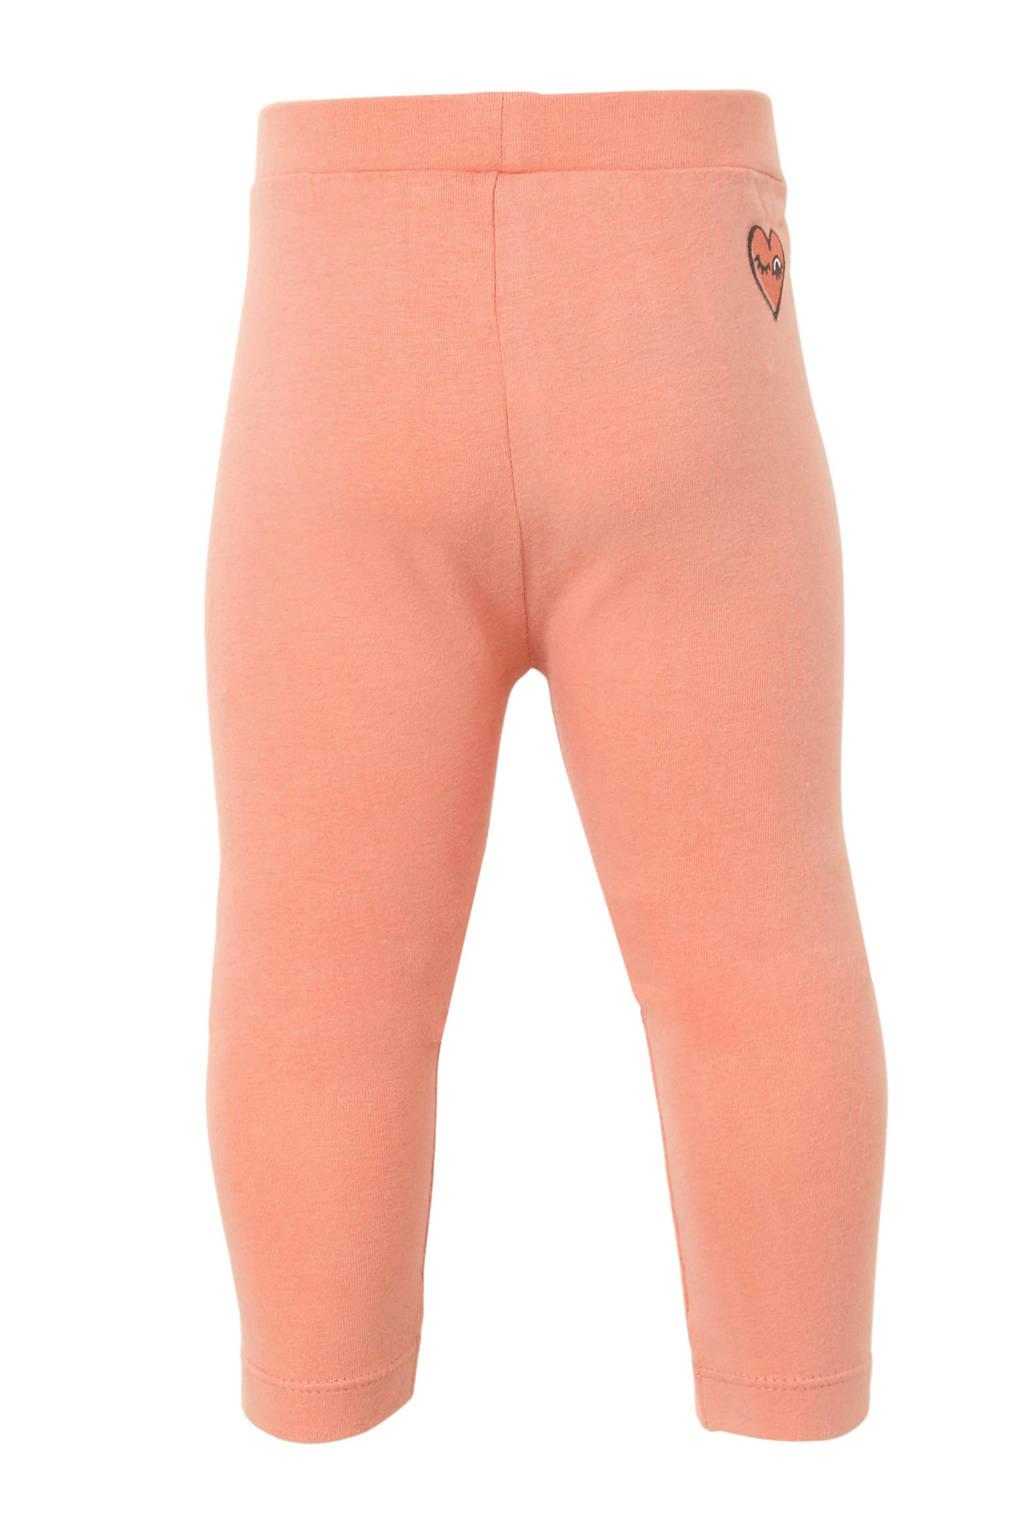 Tumble 'n Dry Lo legging, Oranje